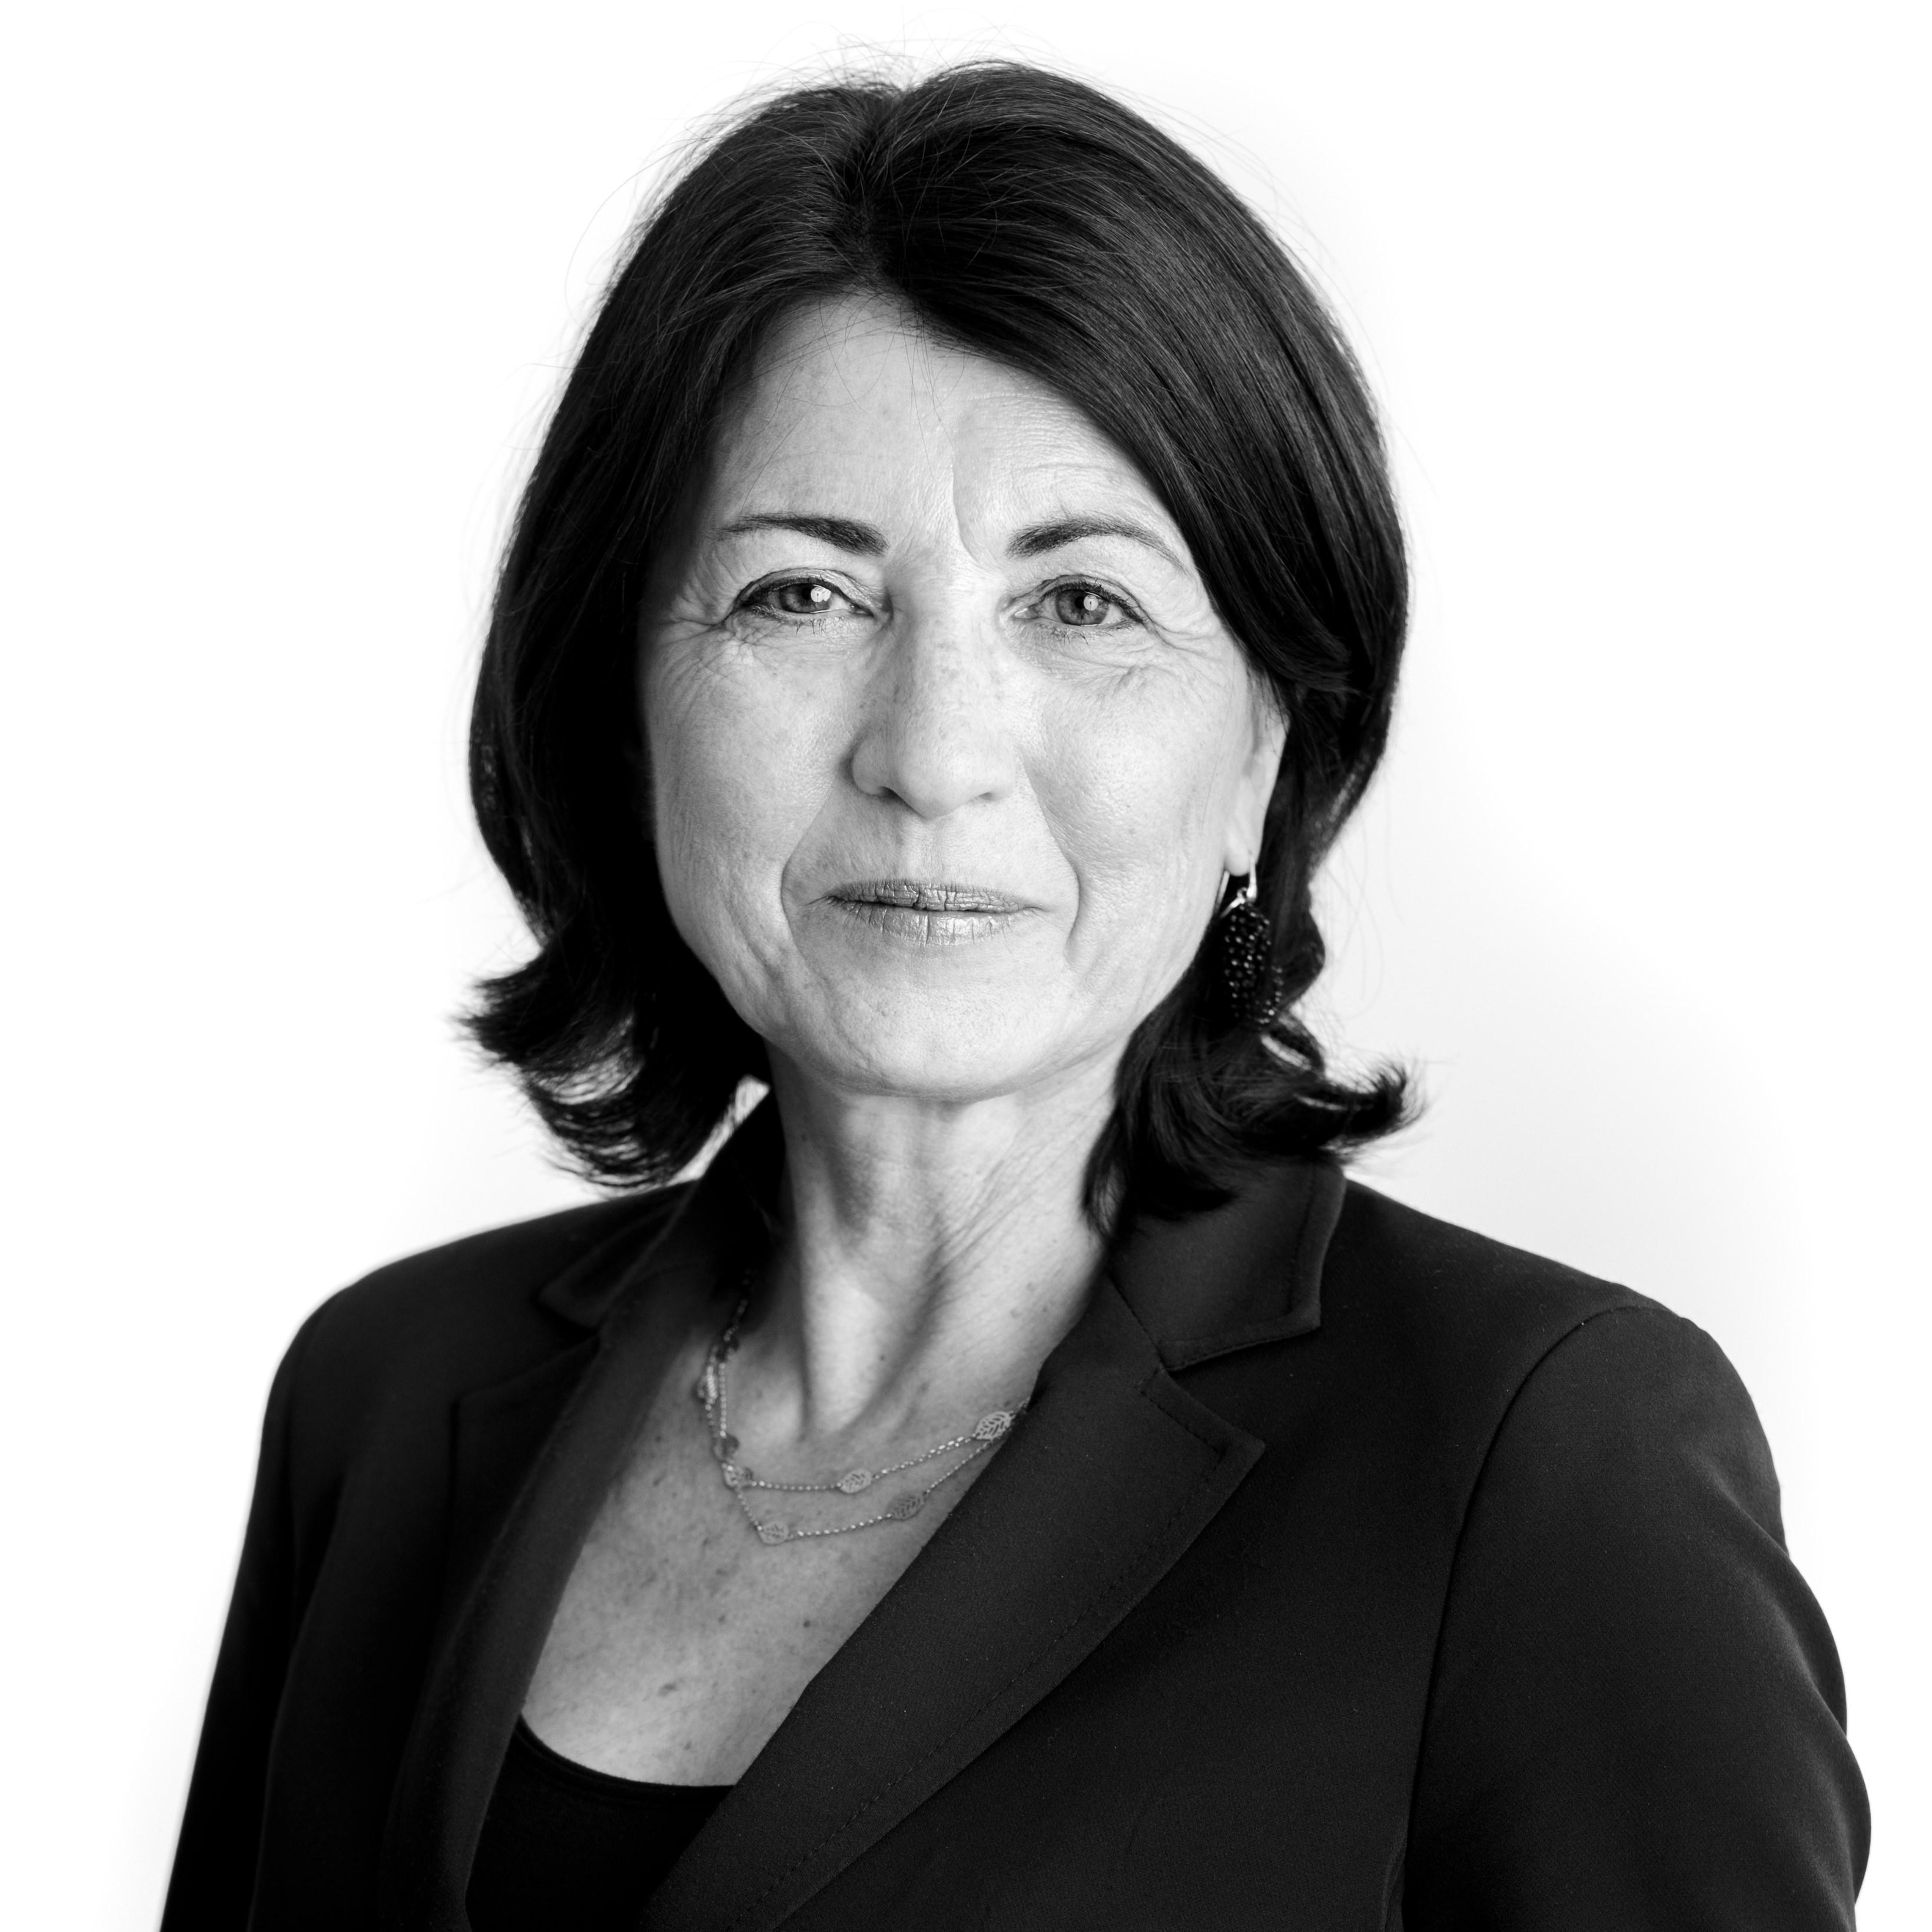 Anja Venhoeven